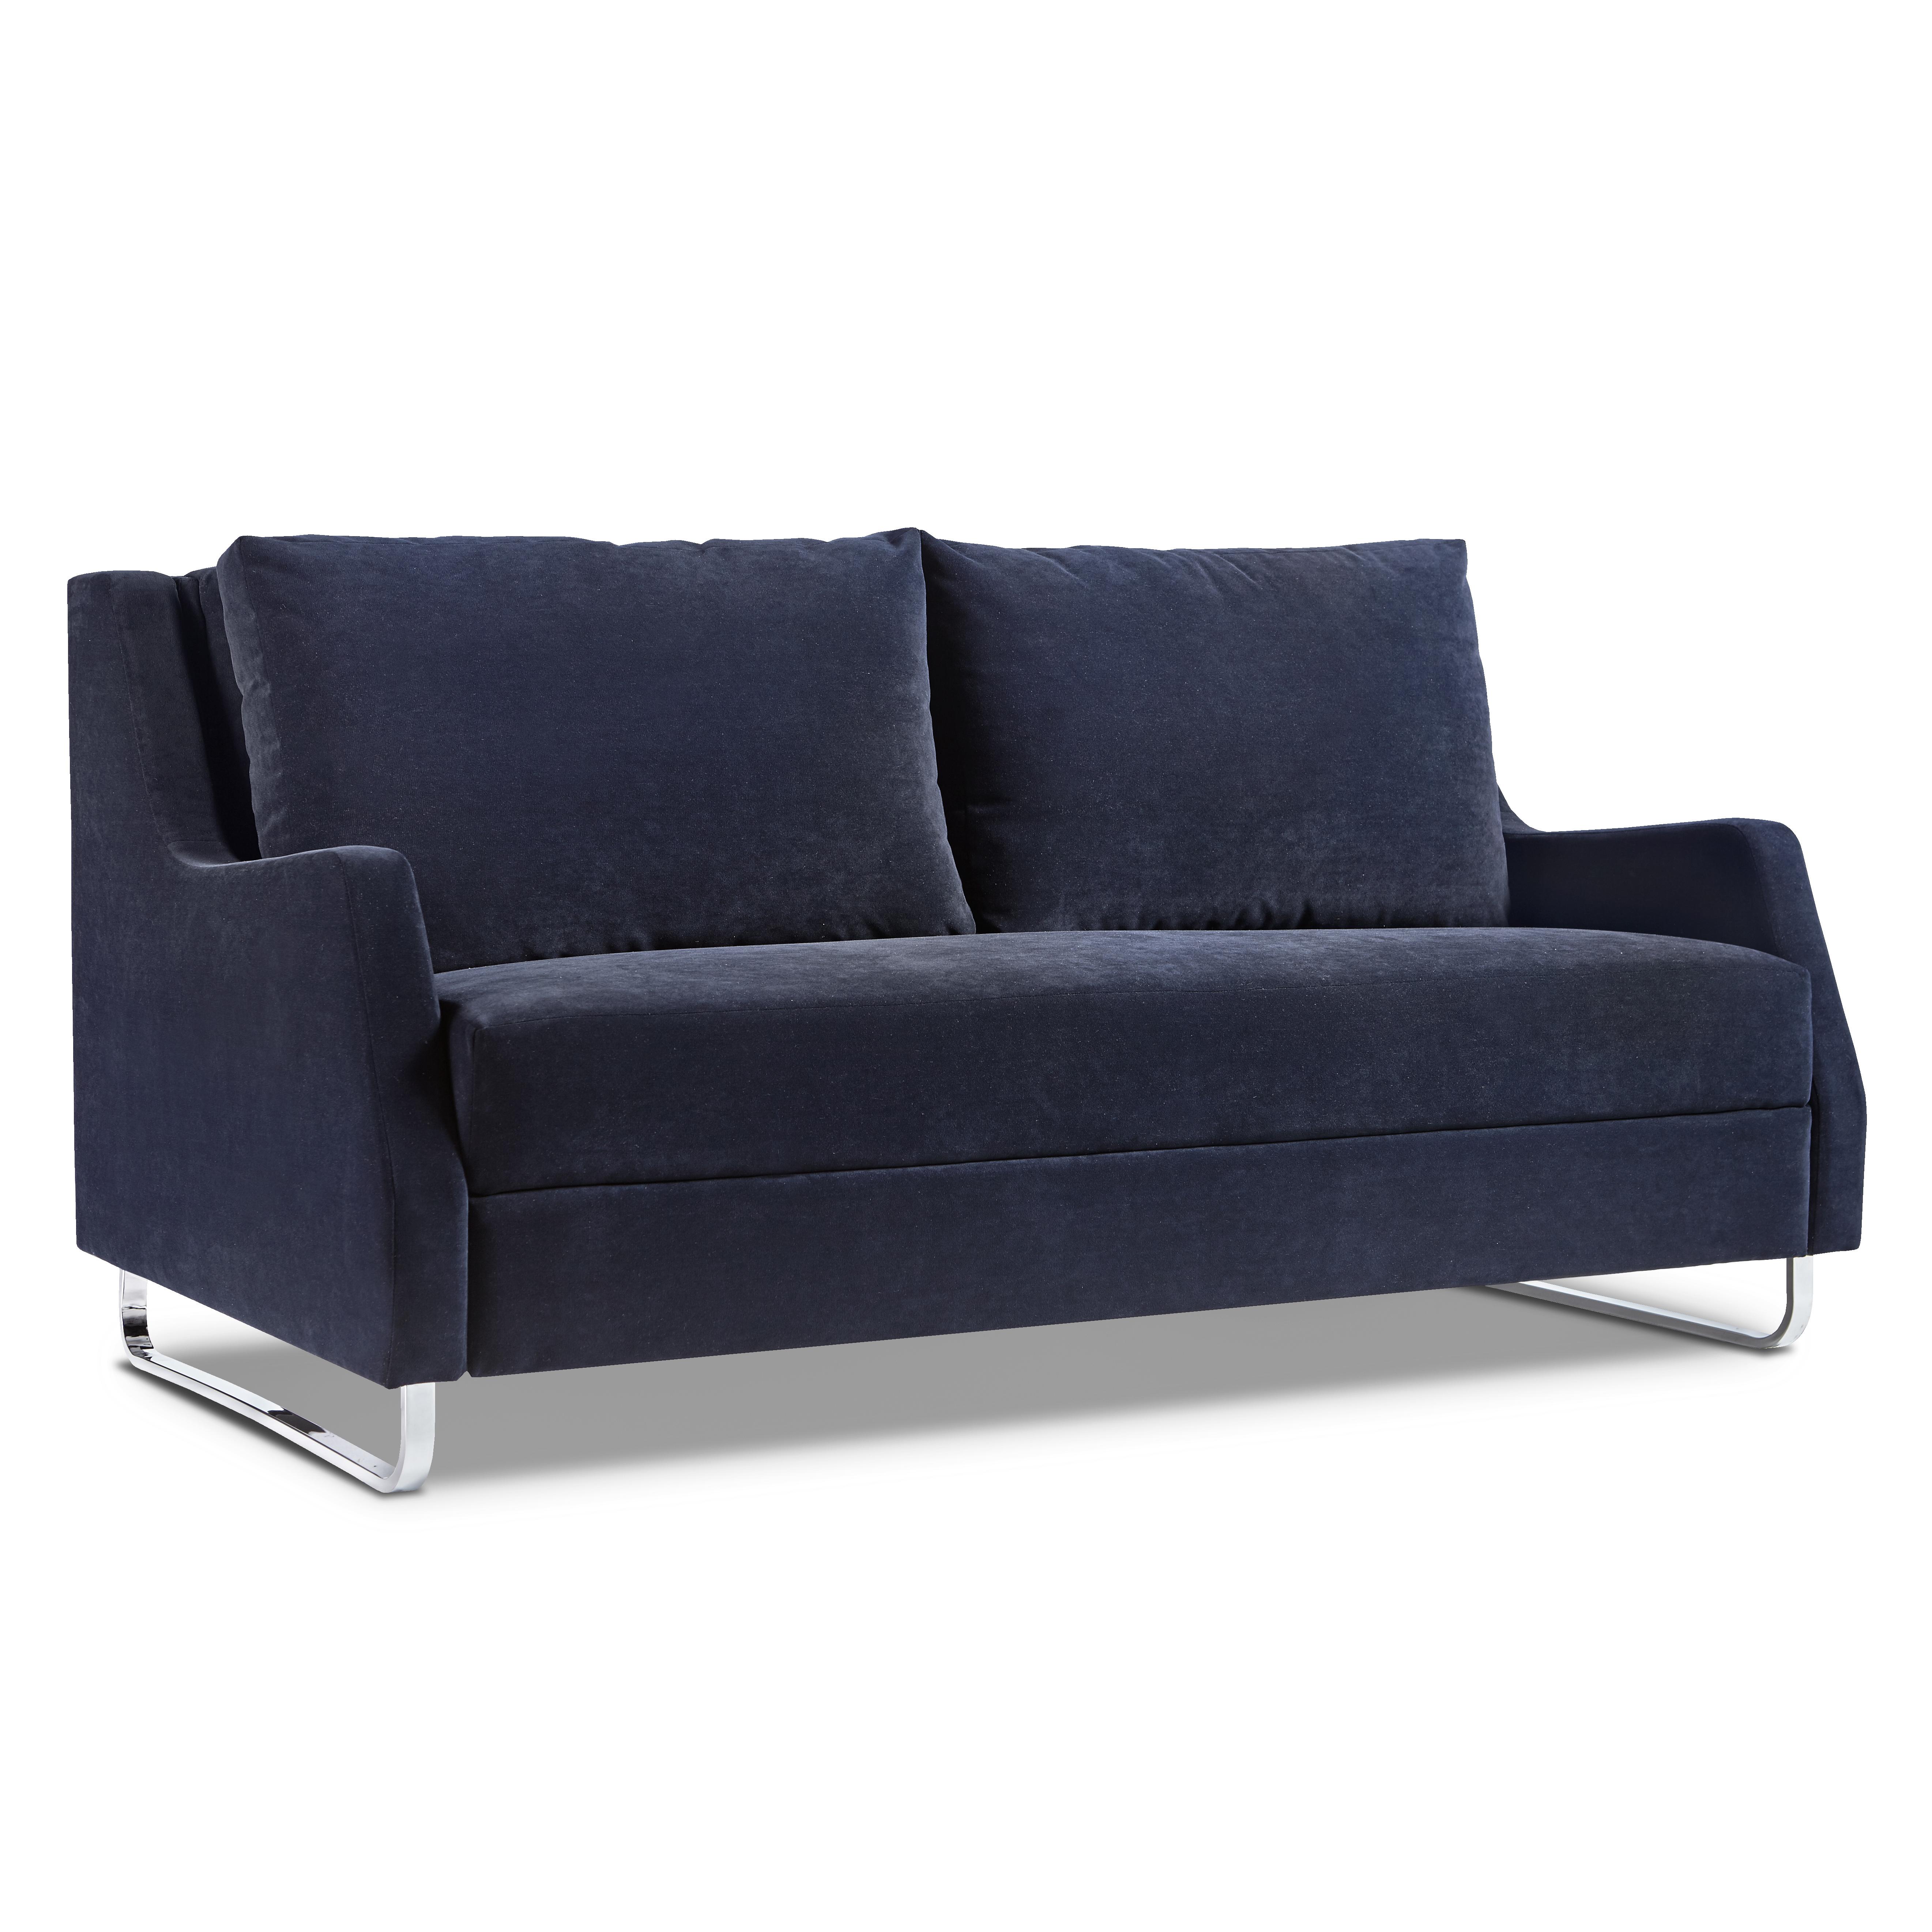 Enjoyable Pierce Condo Size 72 Sofa Sofas And Sectionals Ibusinesslaw Wood Chair Design Ideas Ibusinesslaworg